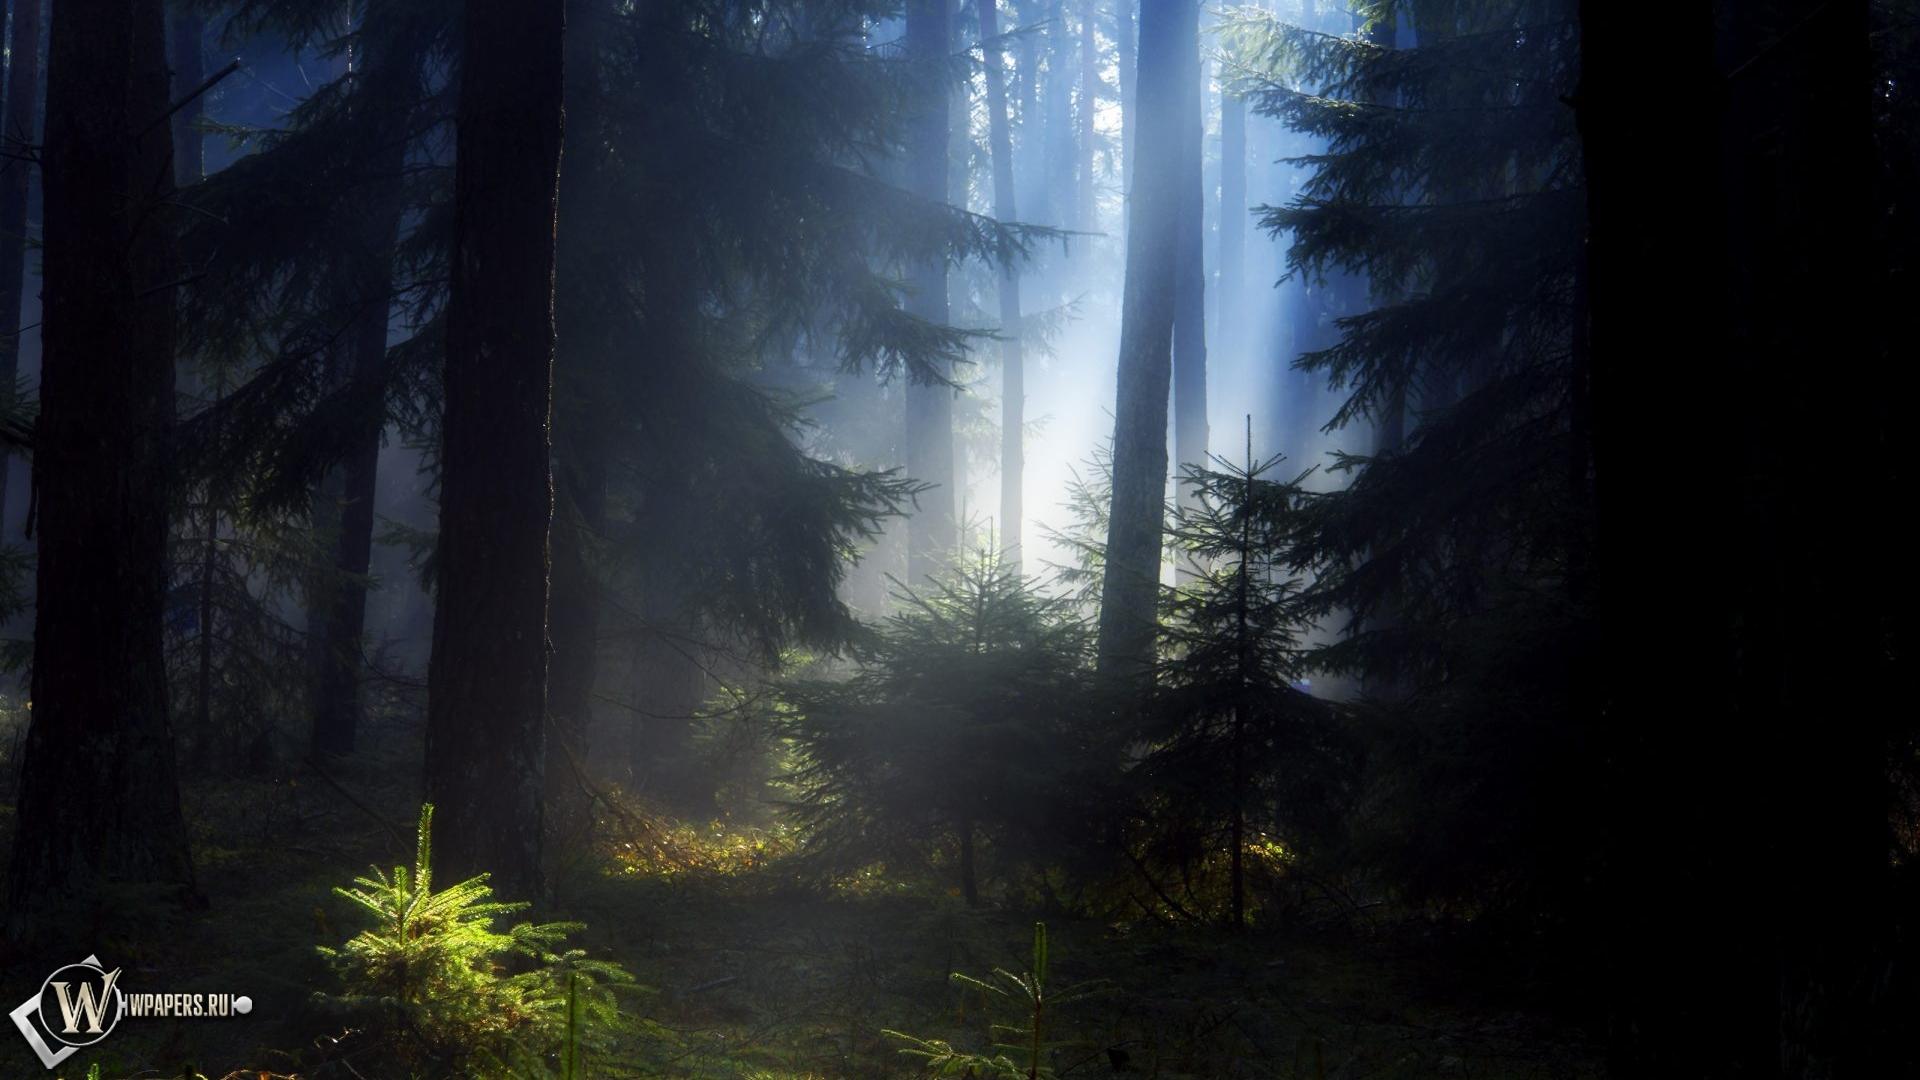 Еловый лес 1920x1080